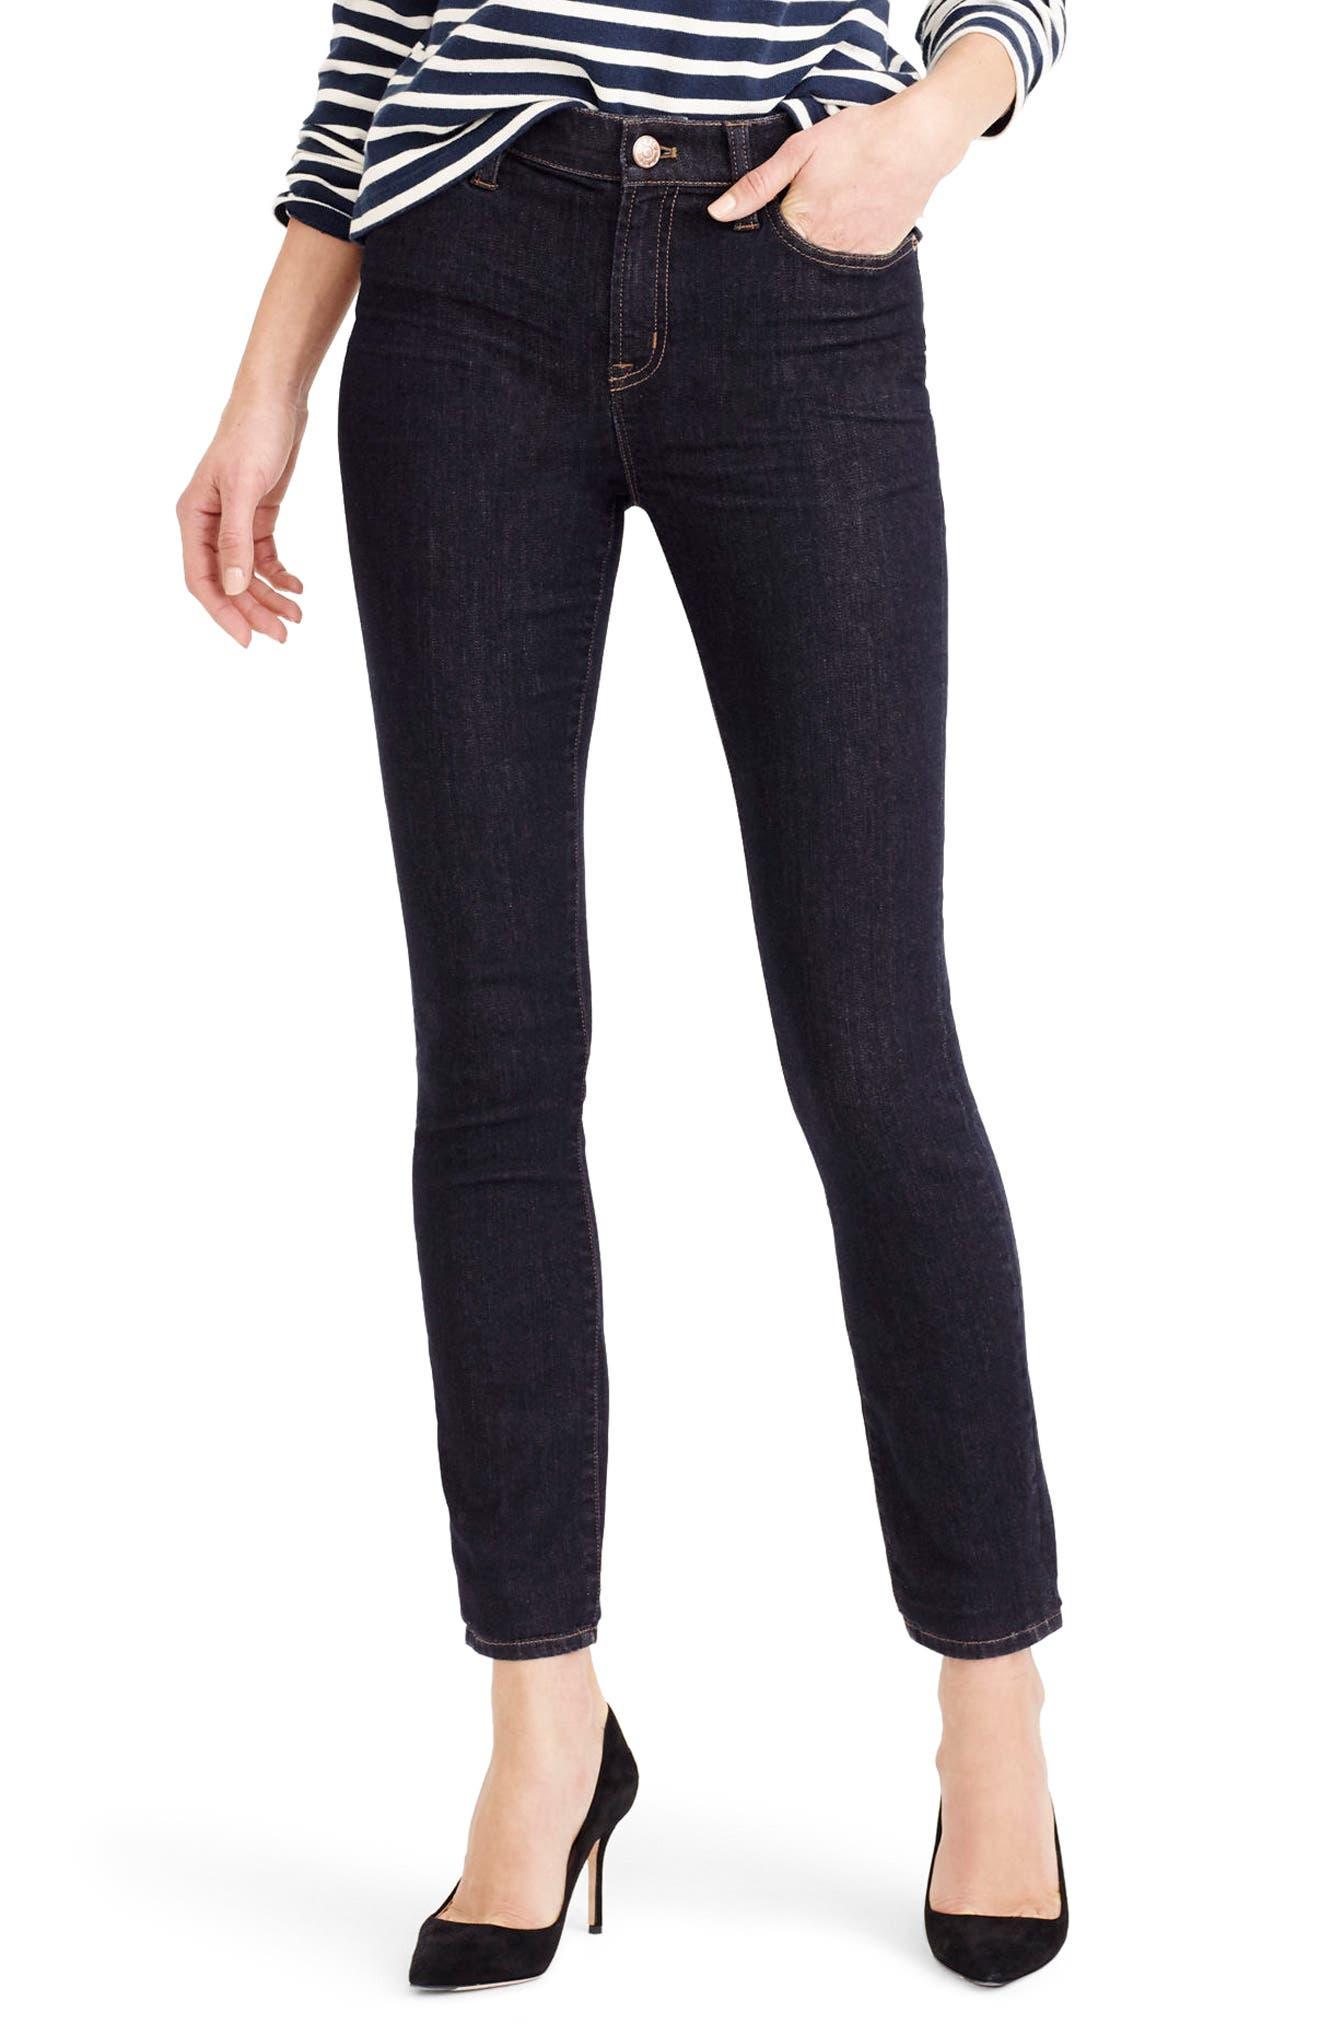 Main Image - J.Crew Lookout High Rise Jeans (Resin) (Regular & Petite)